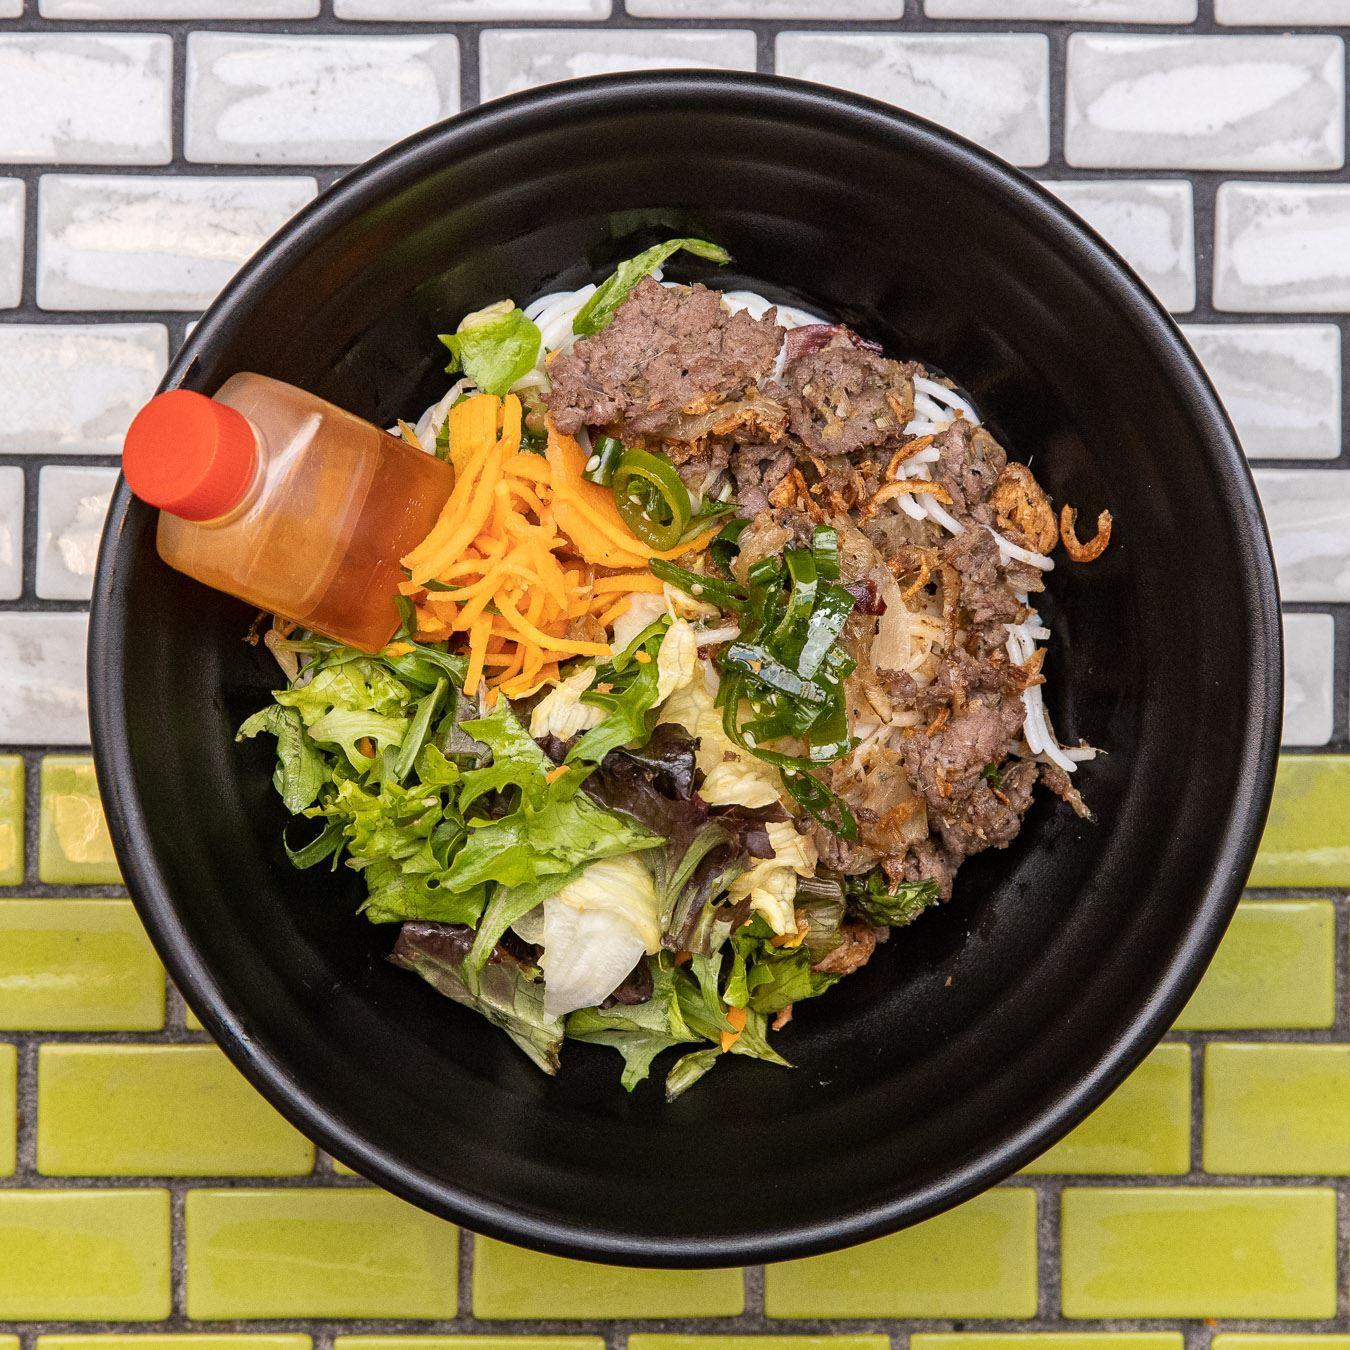 Mini Vermicelli Noodle Salad - Lemongrass Beef (GF) (DF)